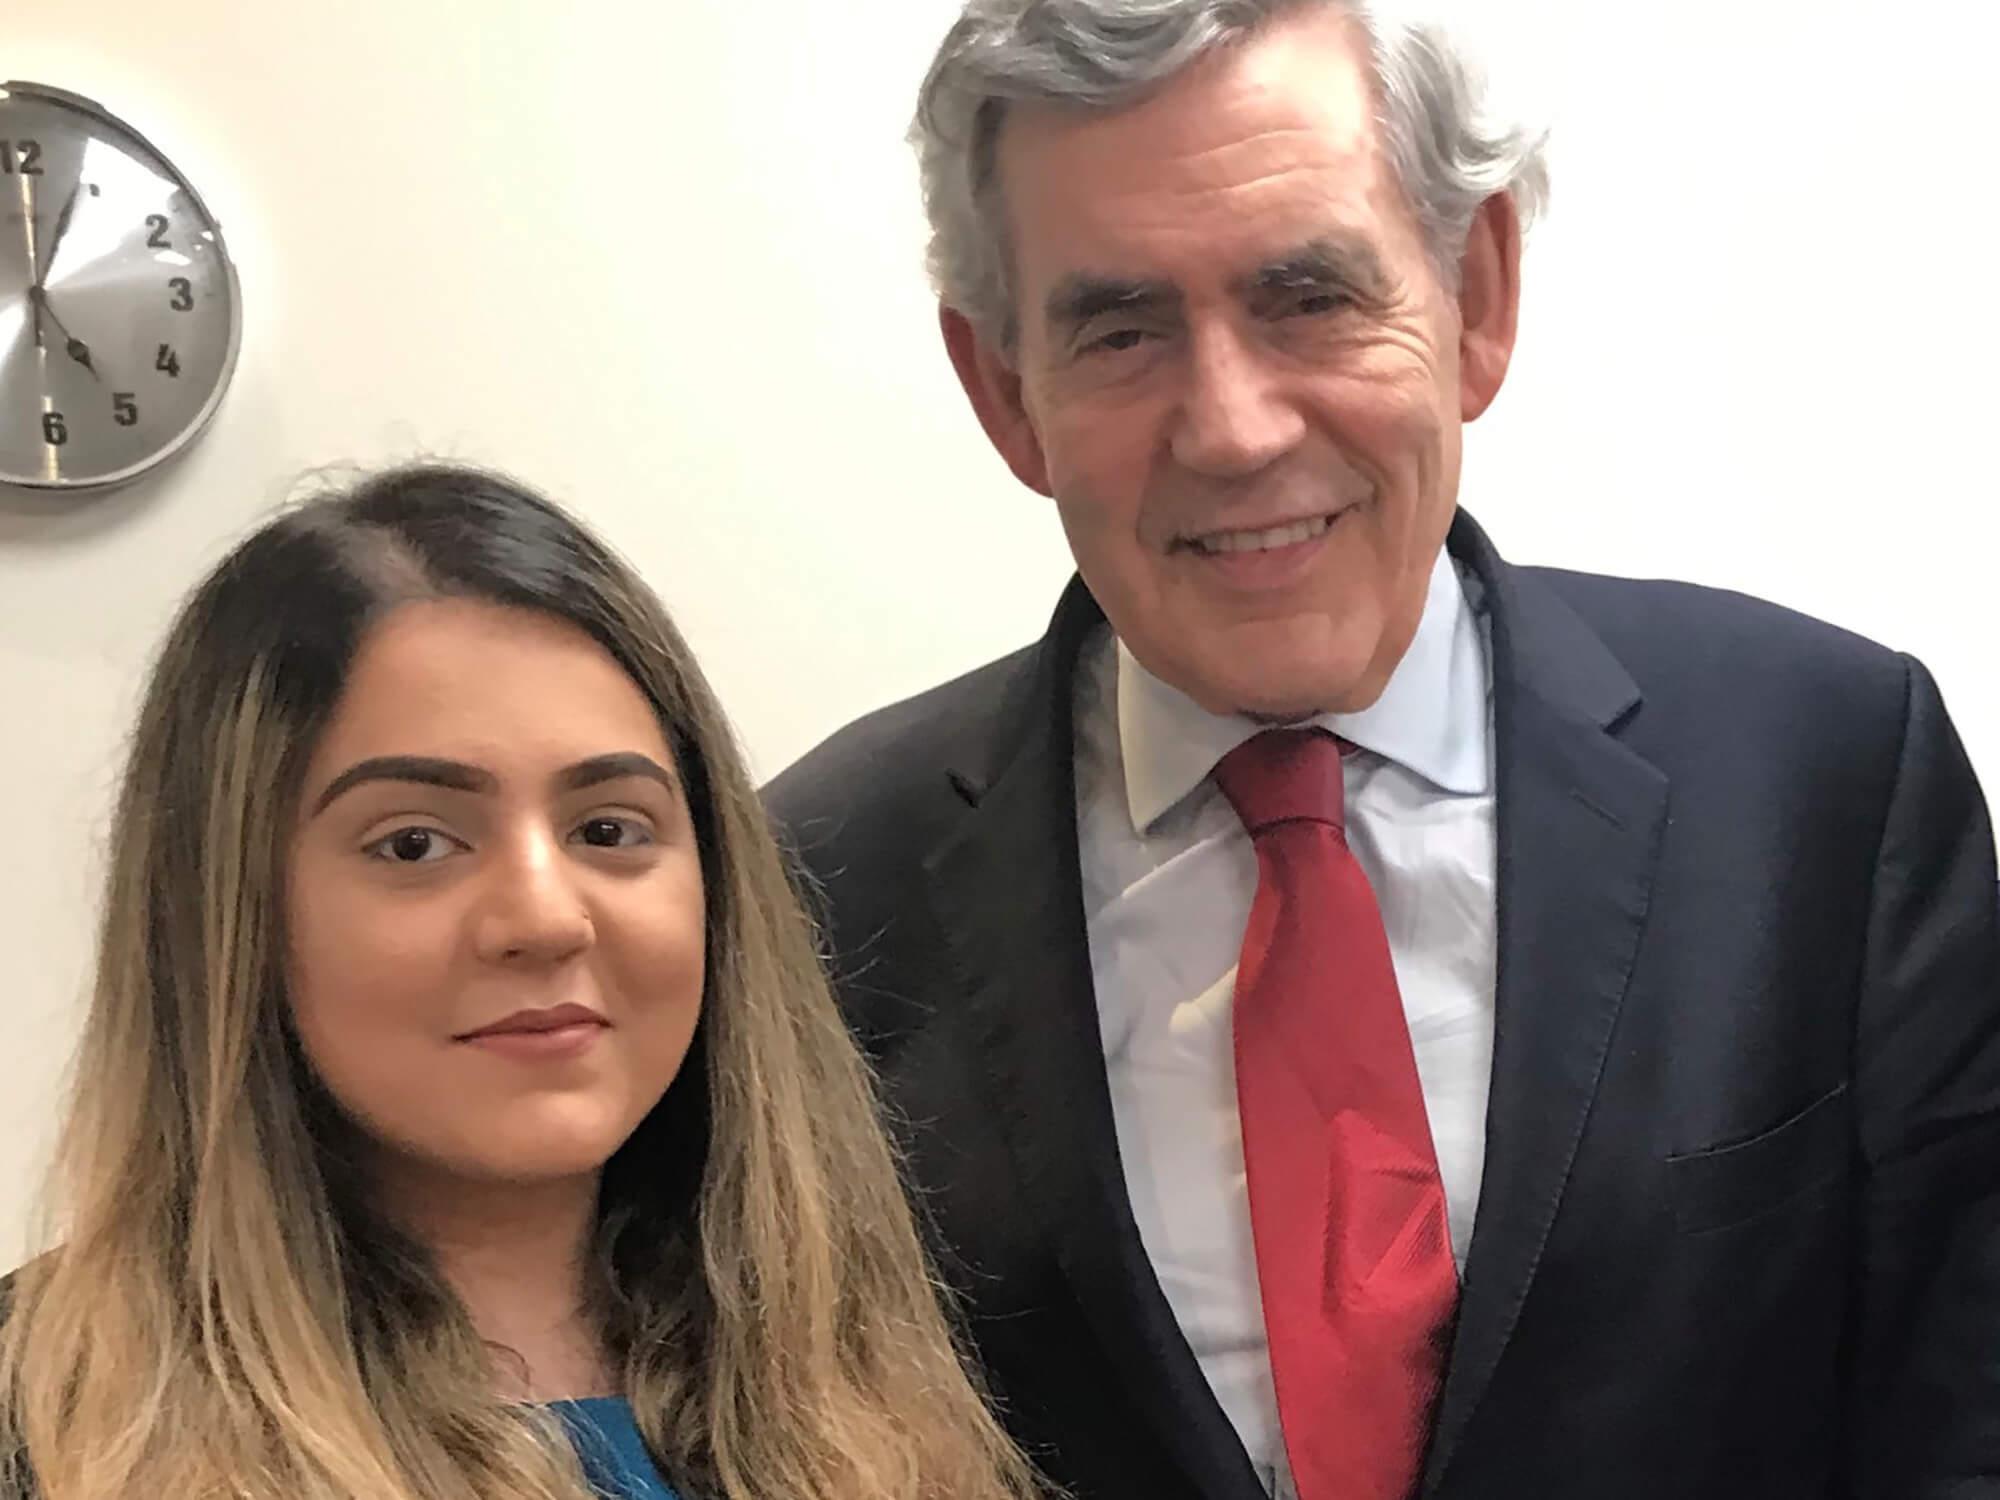 Ikra Yasin stood with Gordon Brown